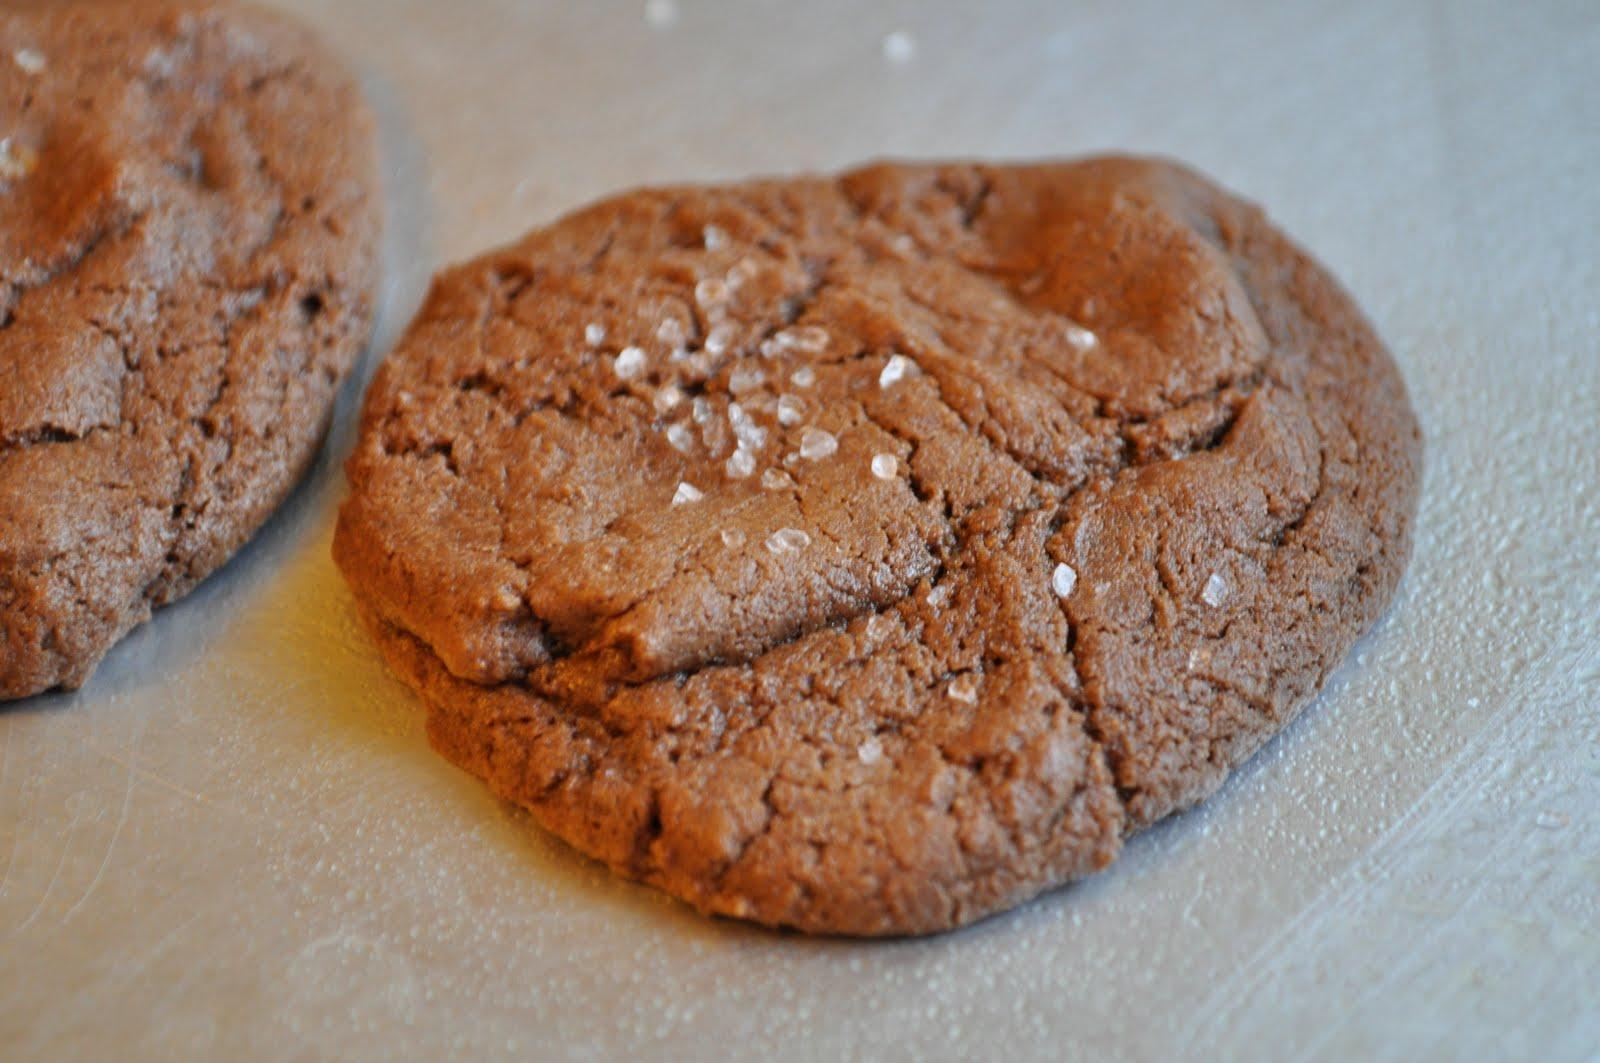 Crusts and Crumbs: Chocolate Caramel Cookies with Sea Salt